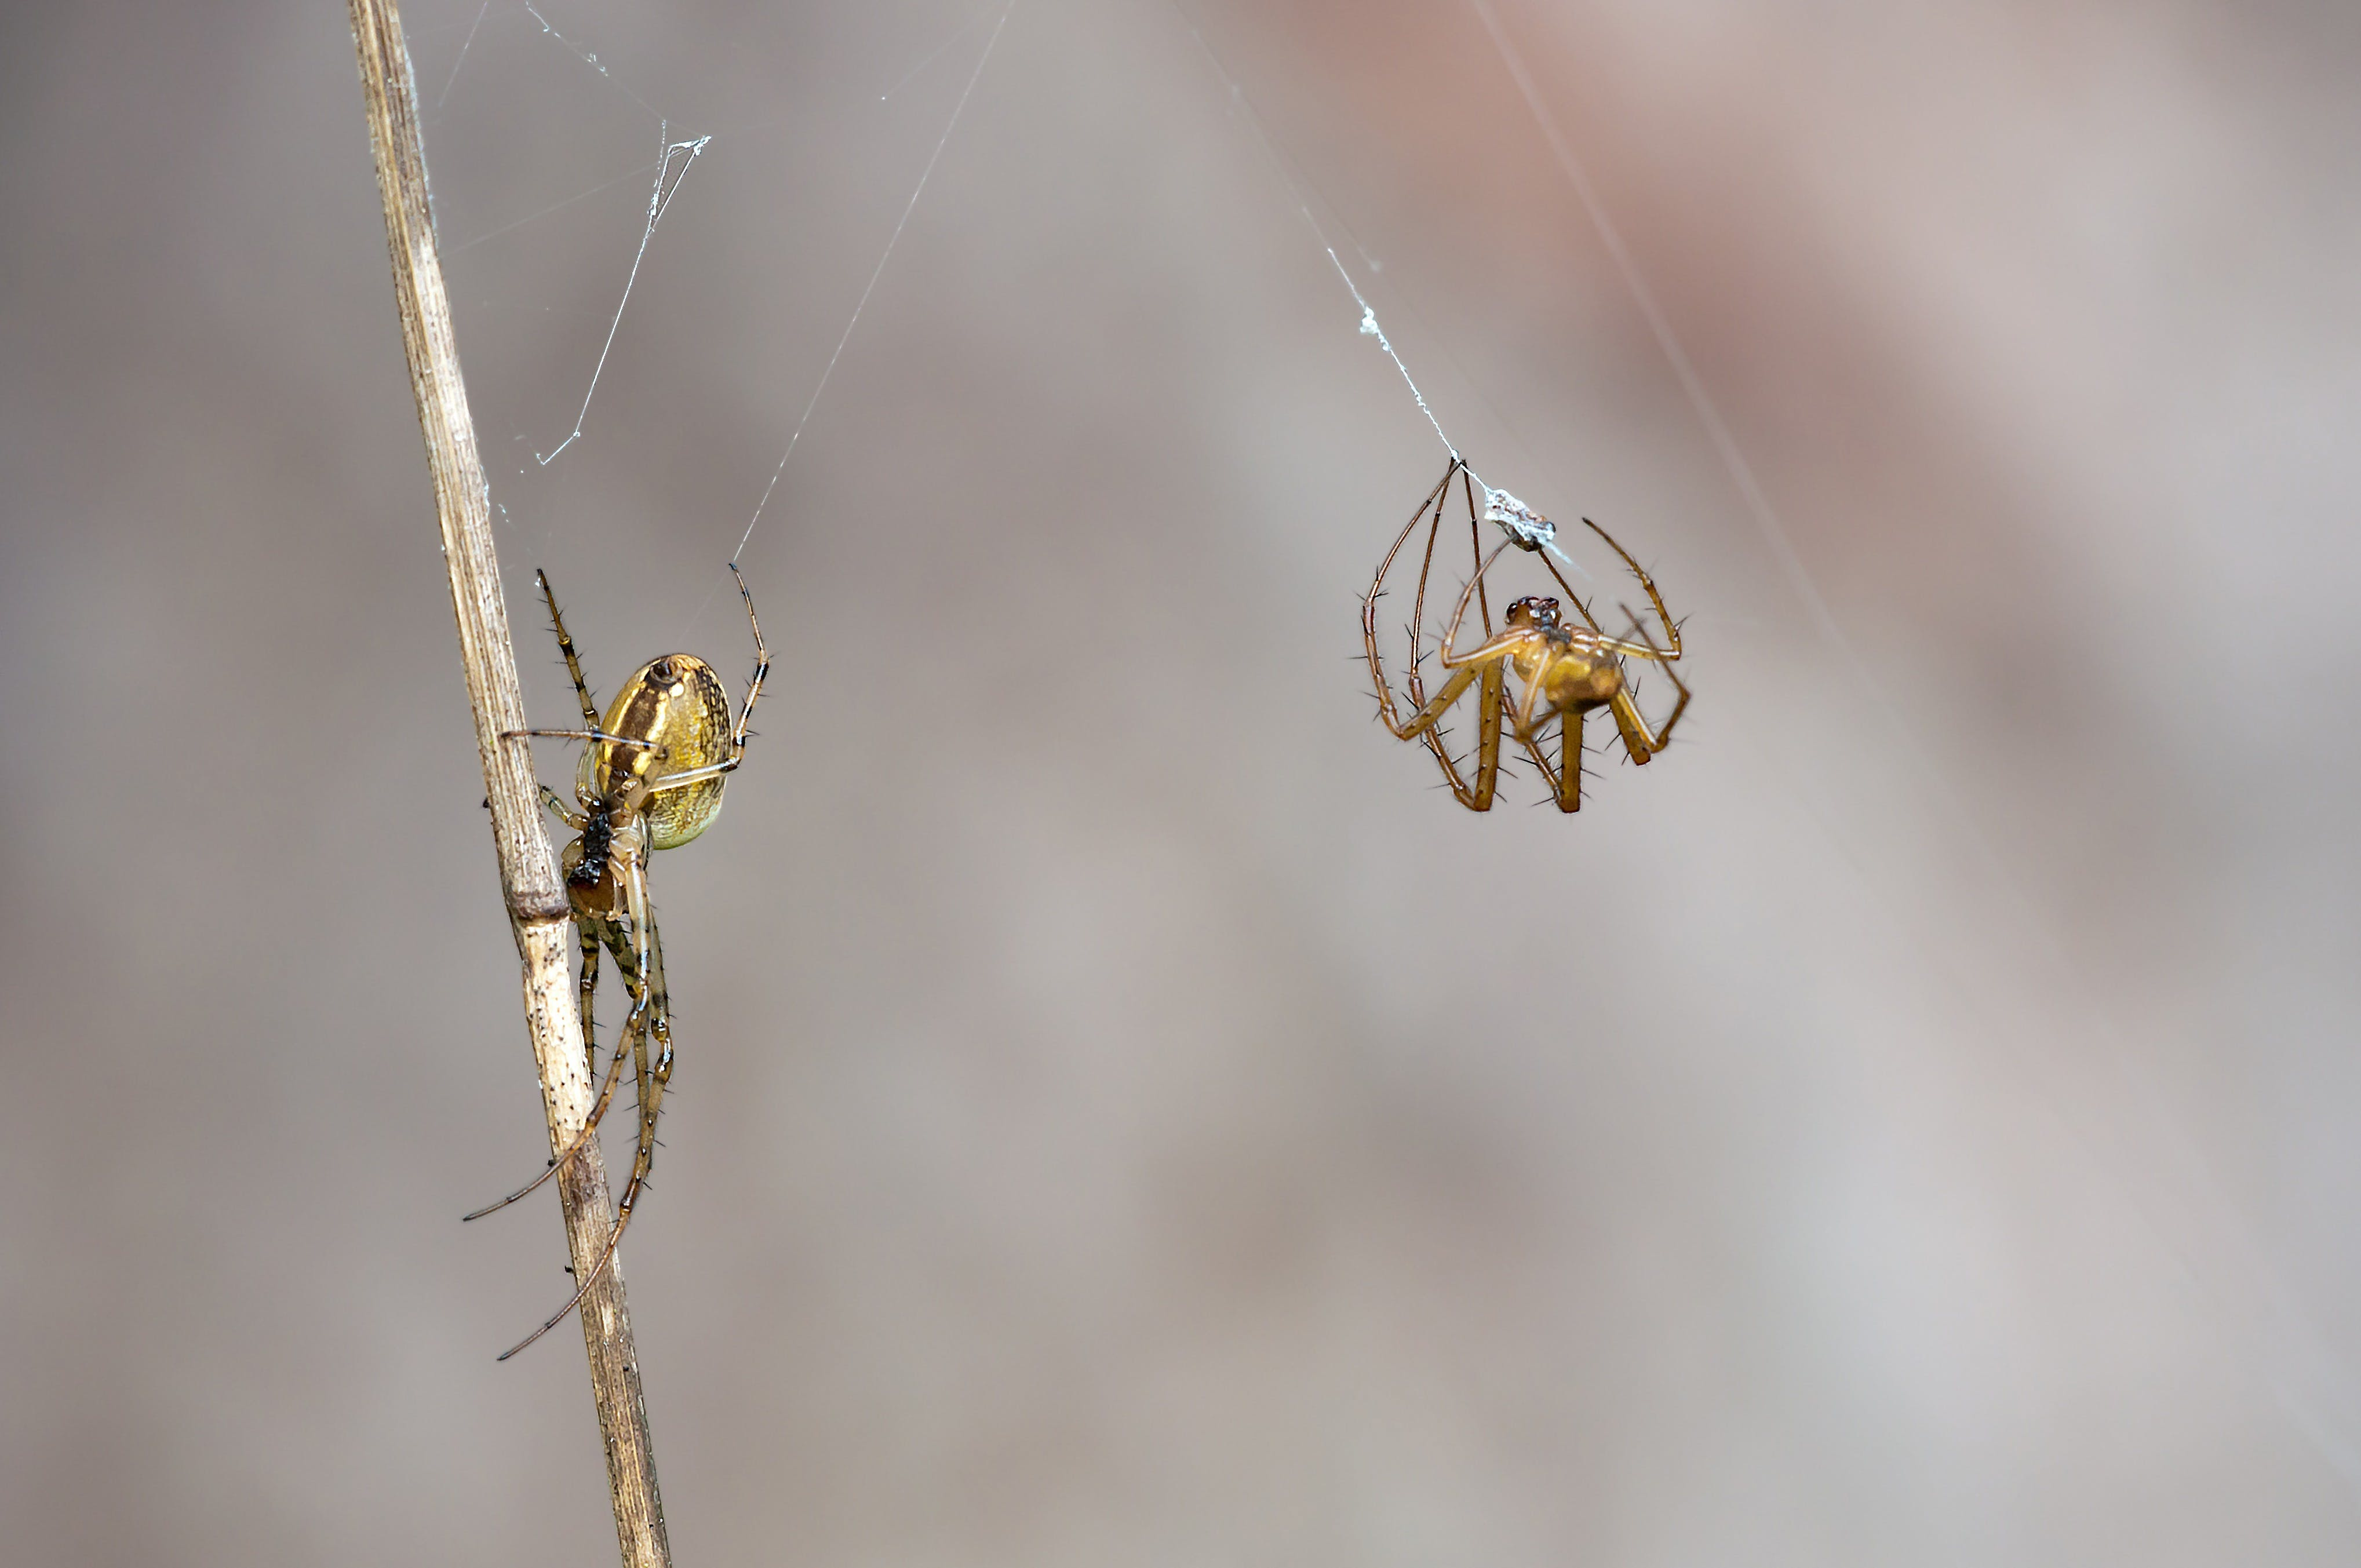 2 Yellow Orb Weaver Spider Weaving Web